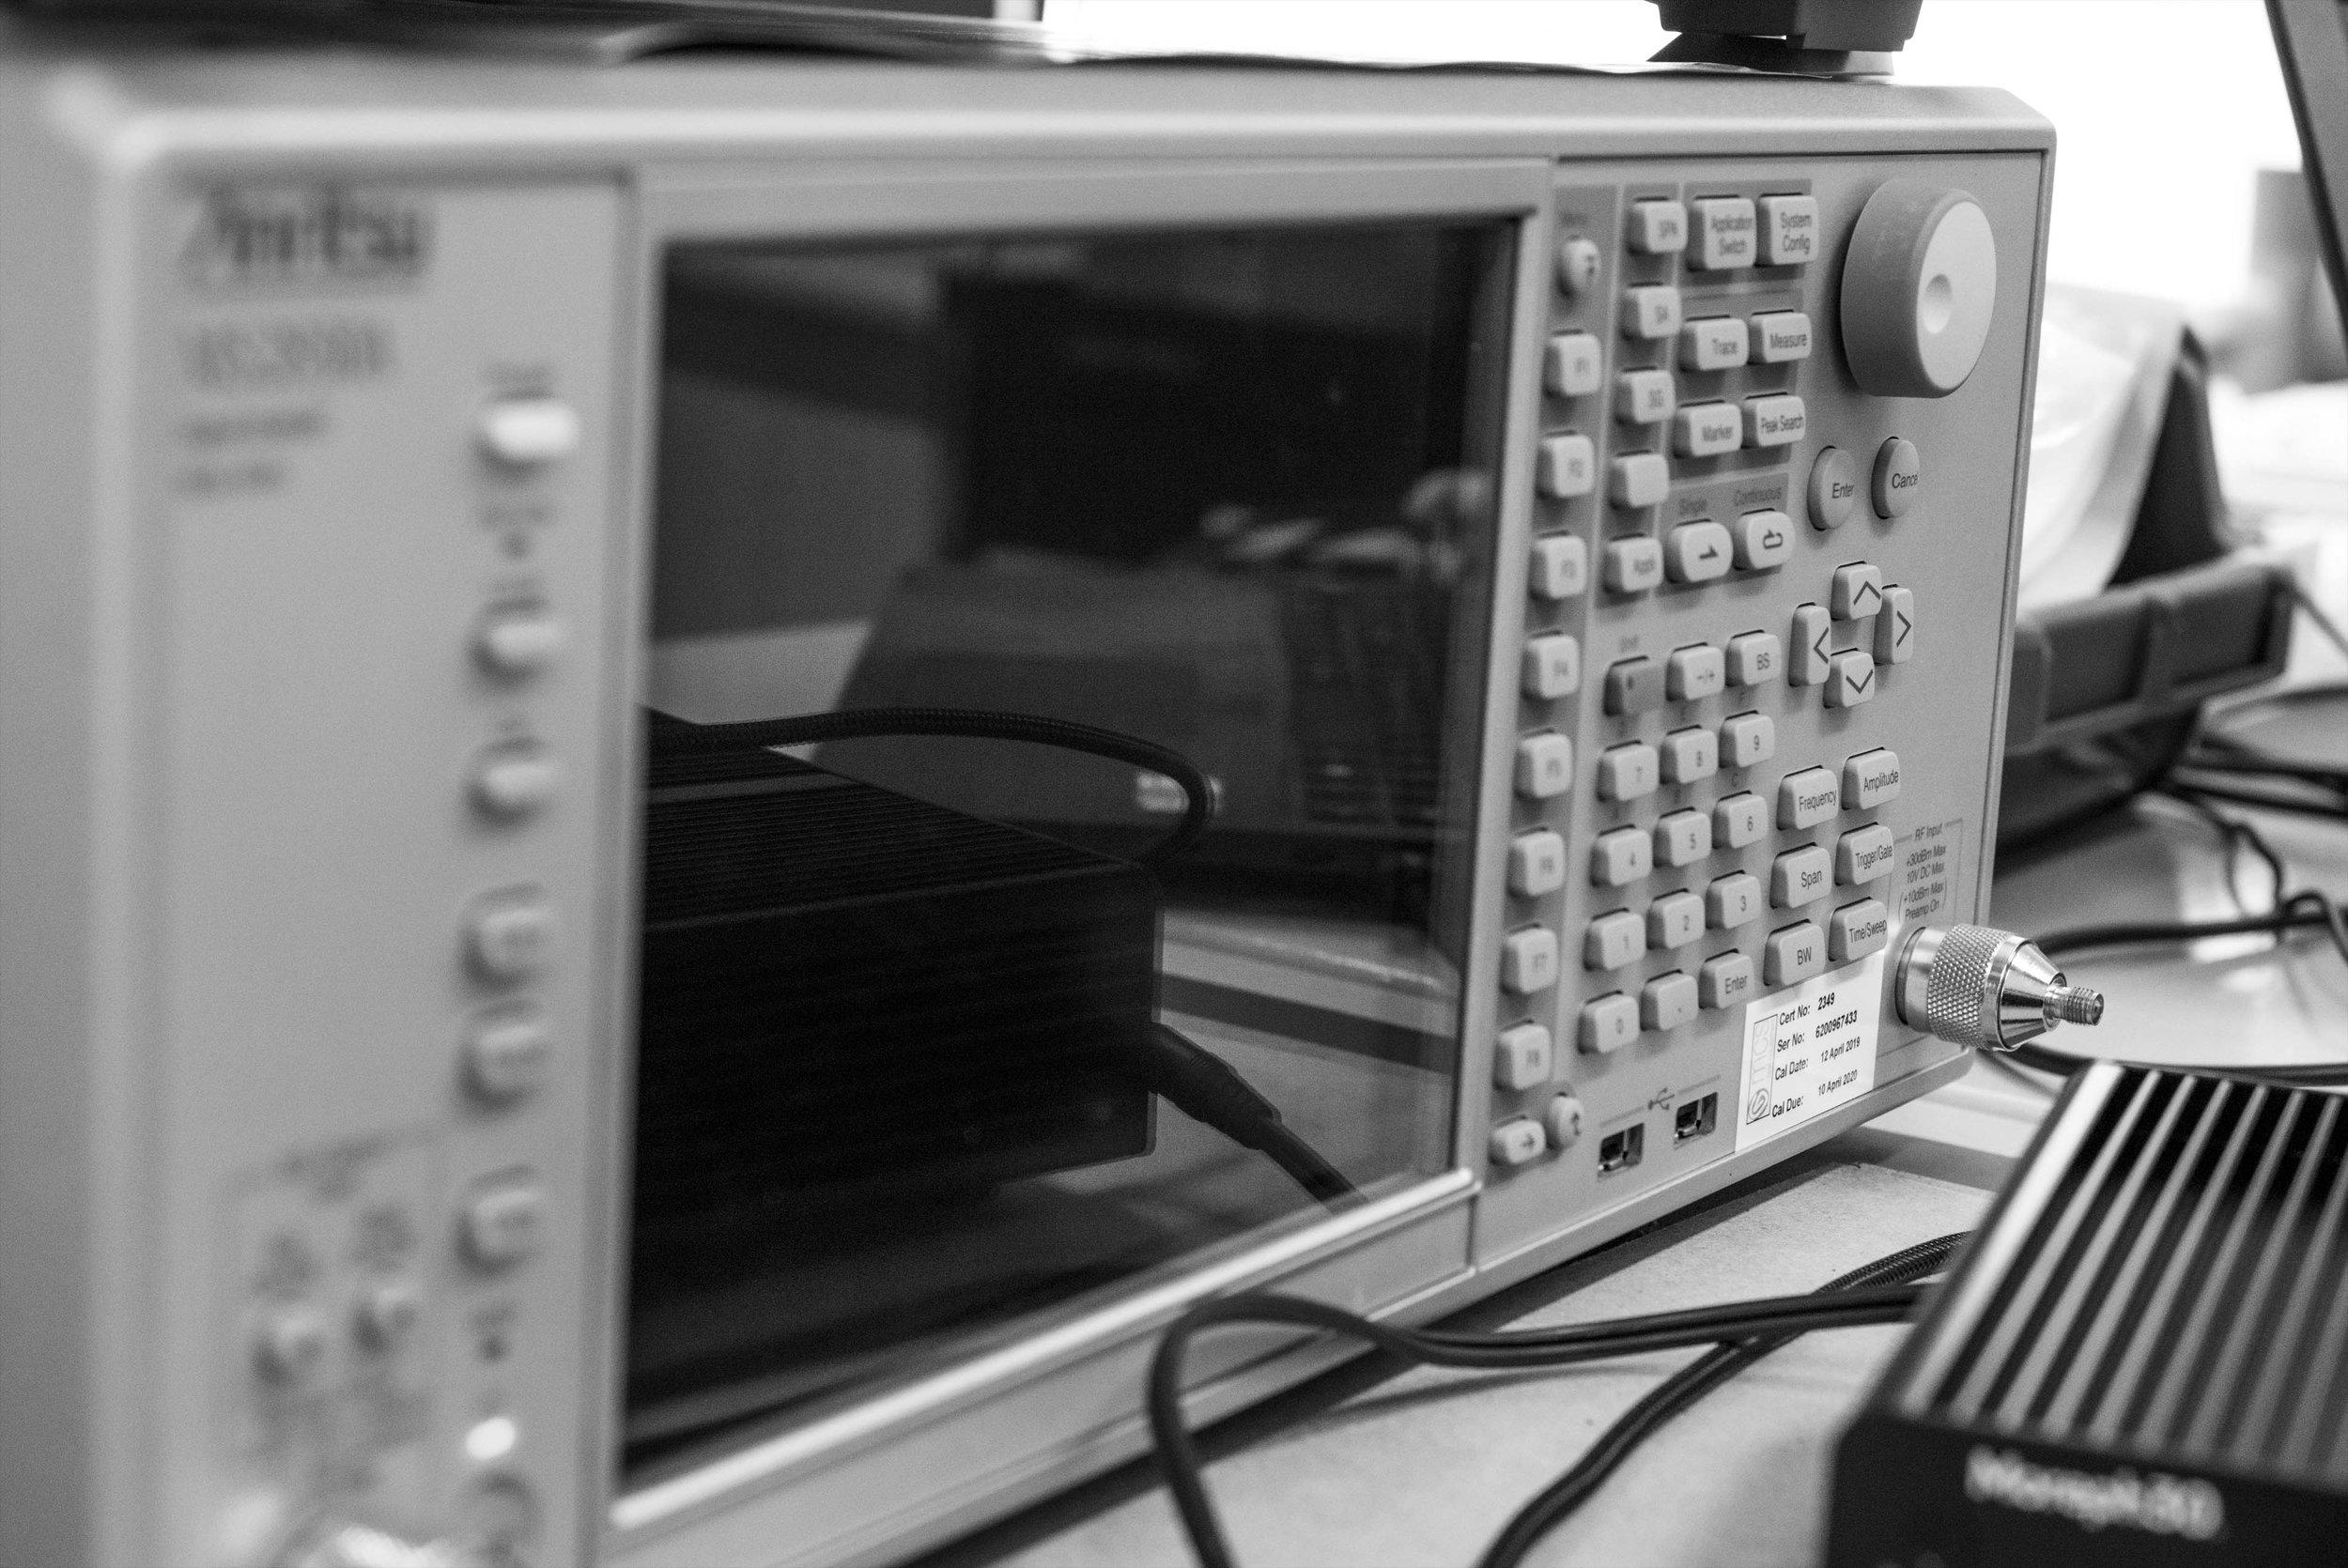 Spectrum analyser and signal generator